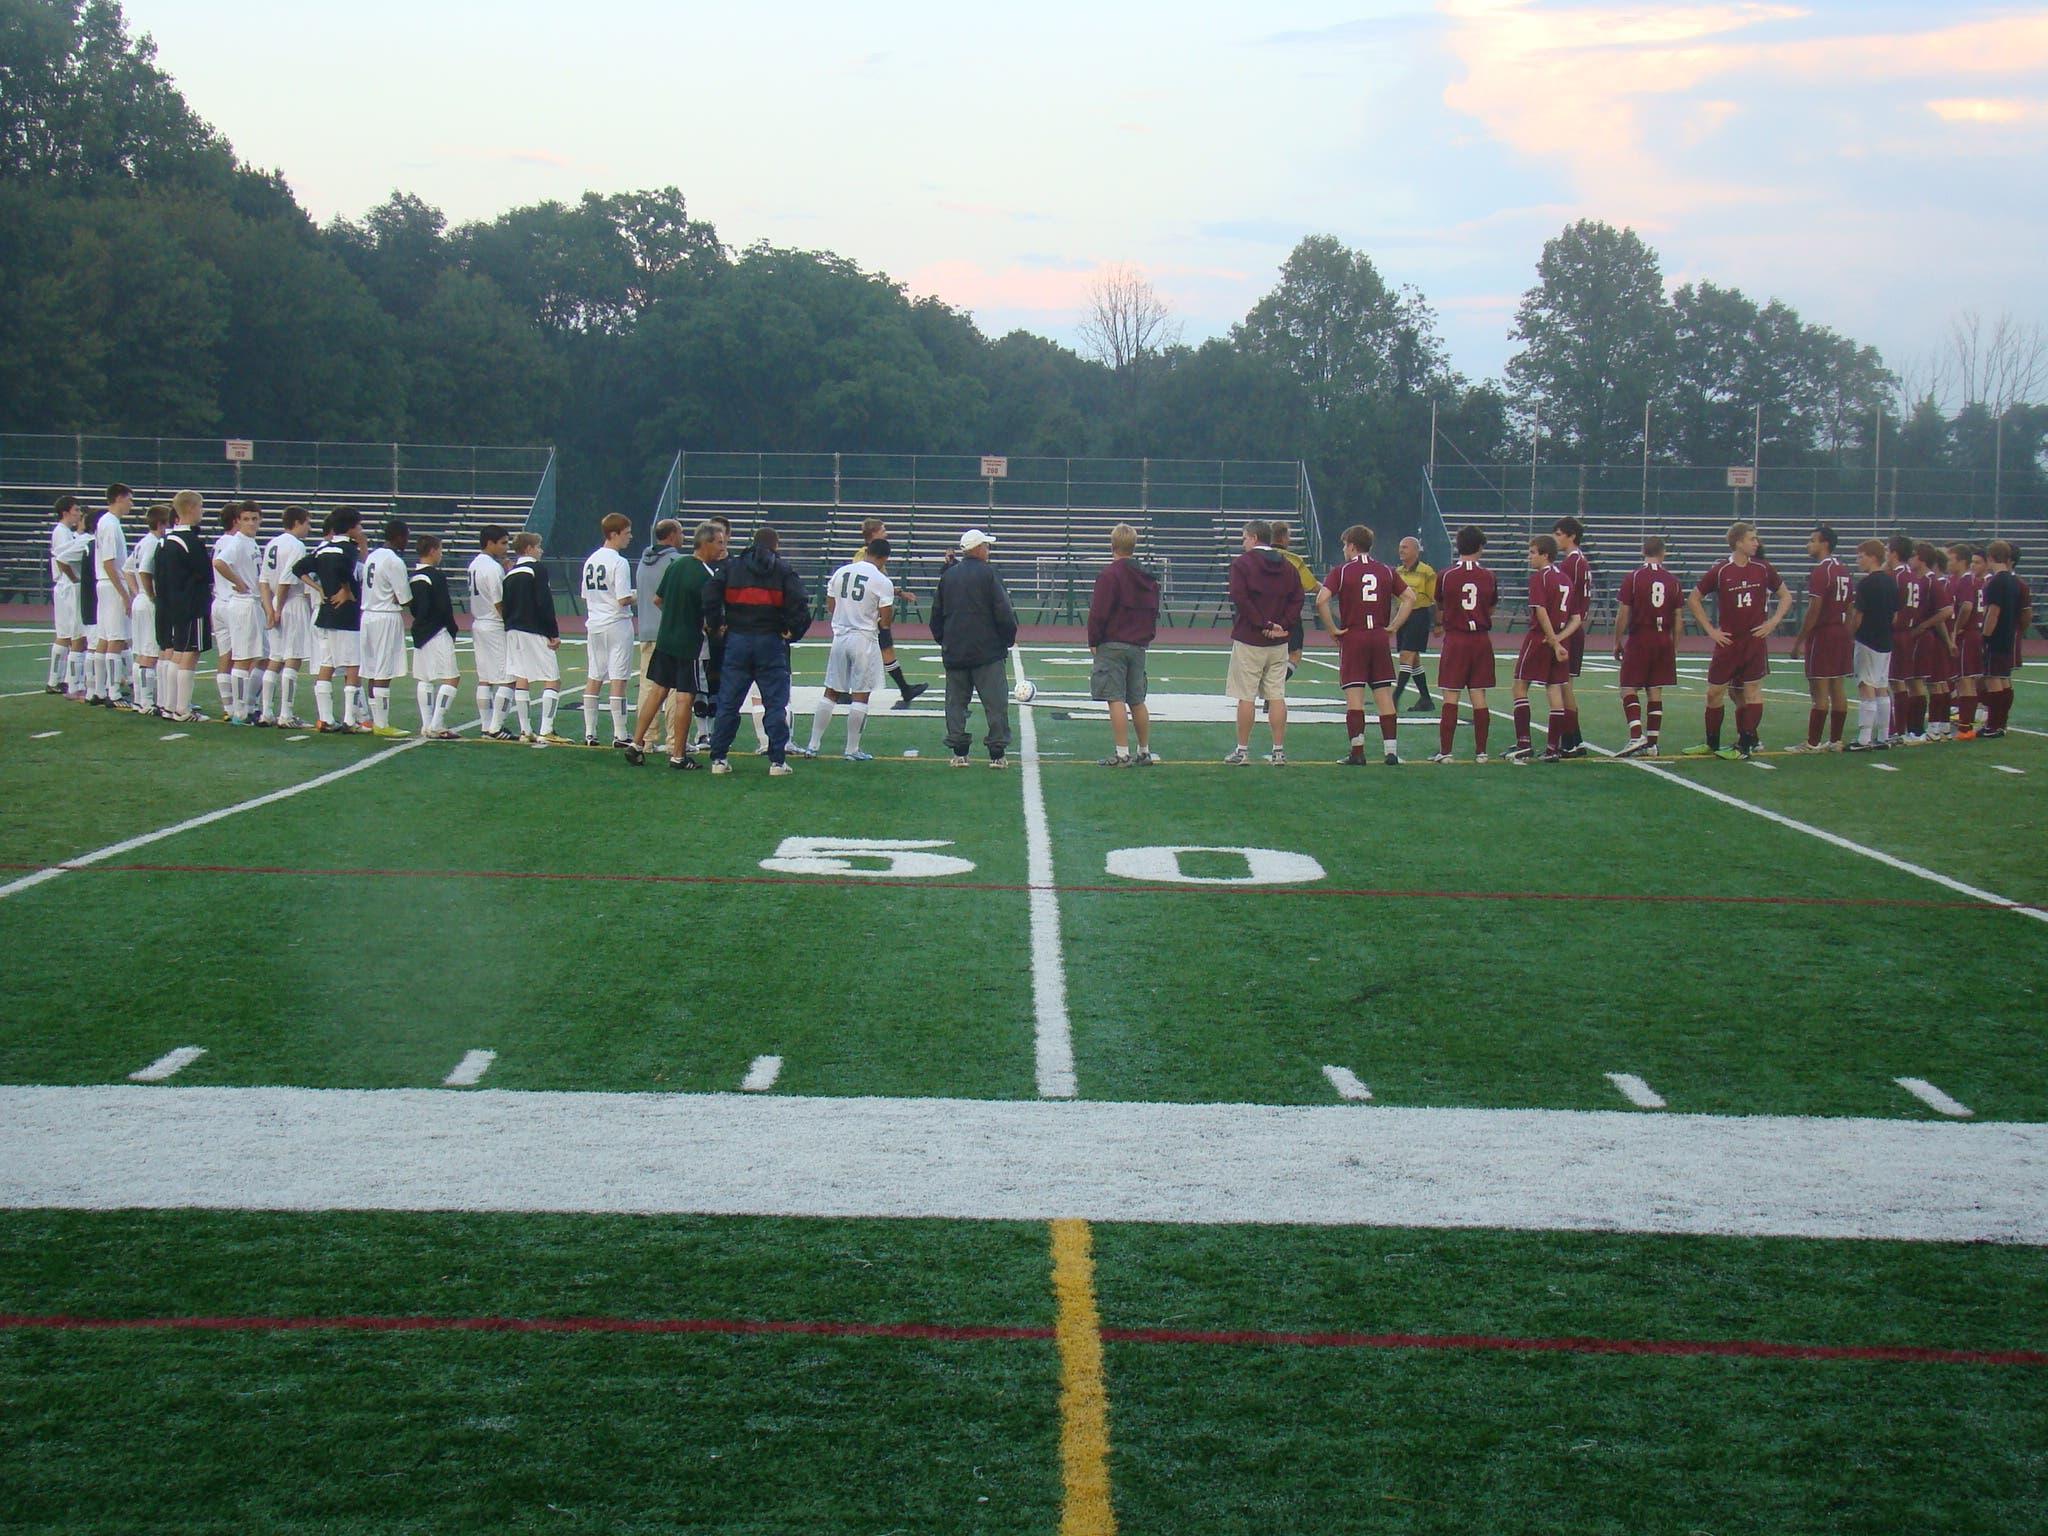 Ramapo Soccer Nets a Victory Over Ridgewood | Wyckoff, NJ ...